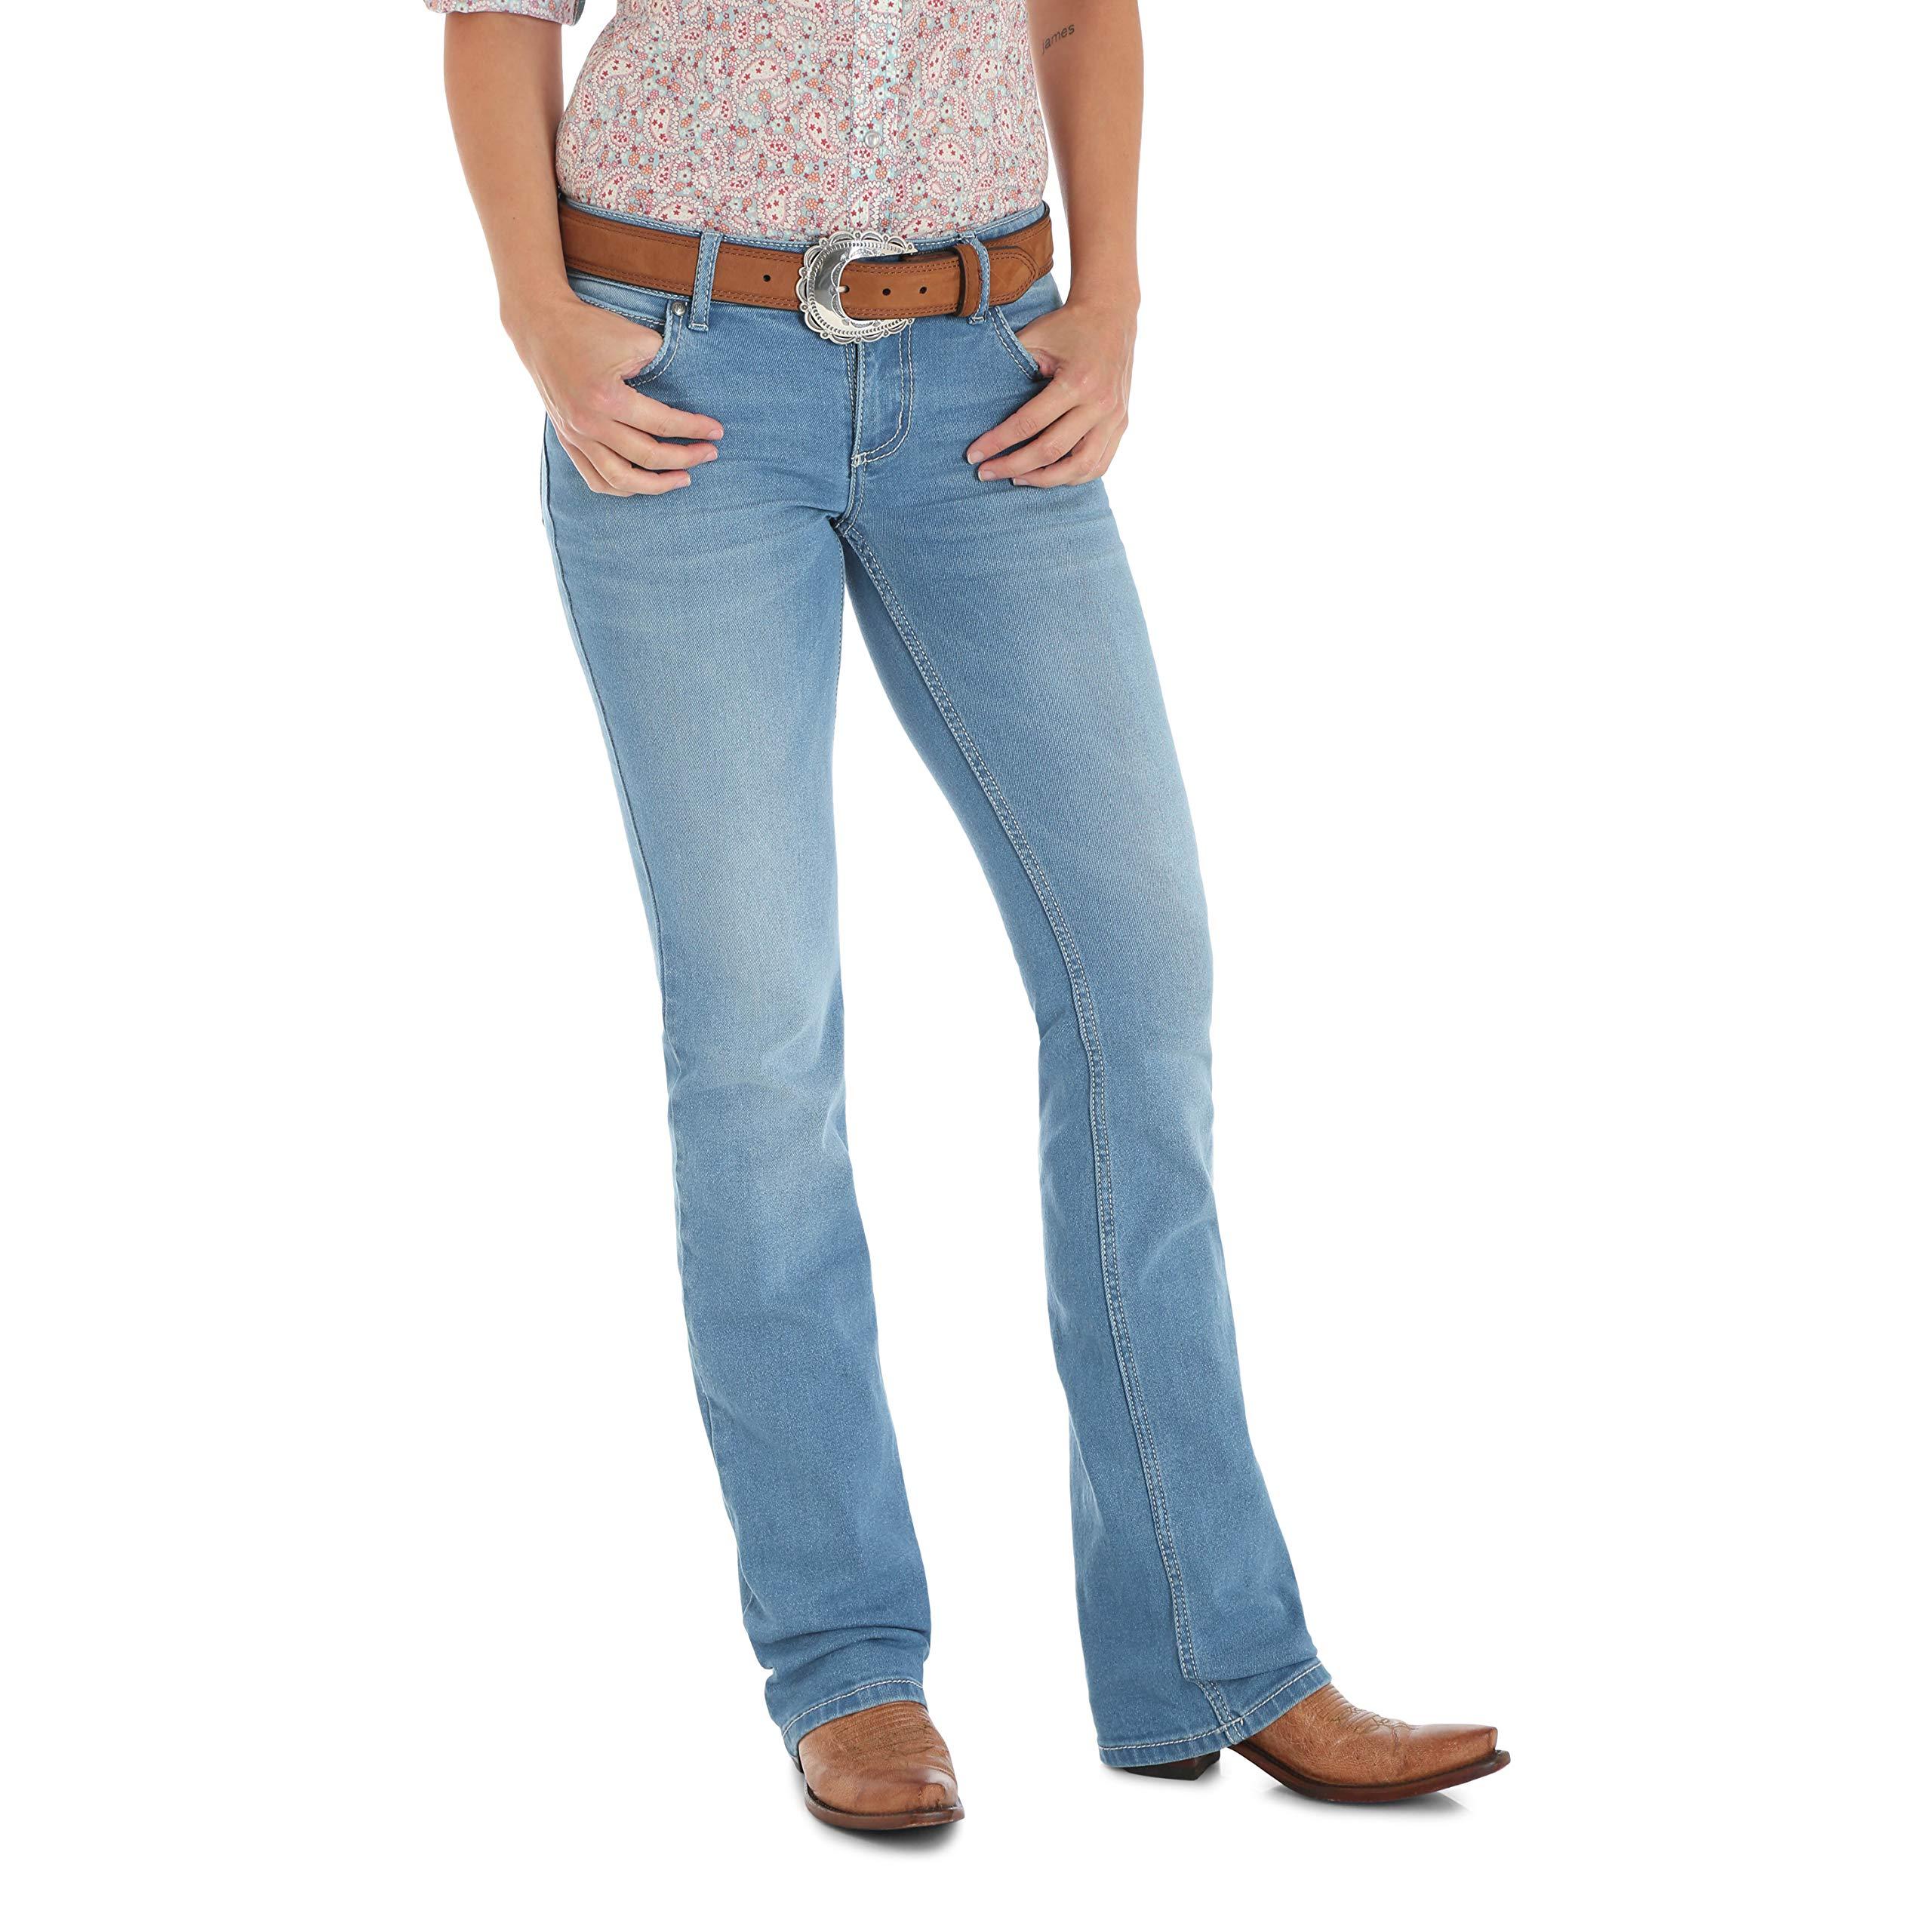 Wrangler Women's Retro Sadie Low Rise Stretch Boot Cut Jean, Concord, 1W x 30L by Wrangler